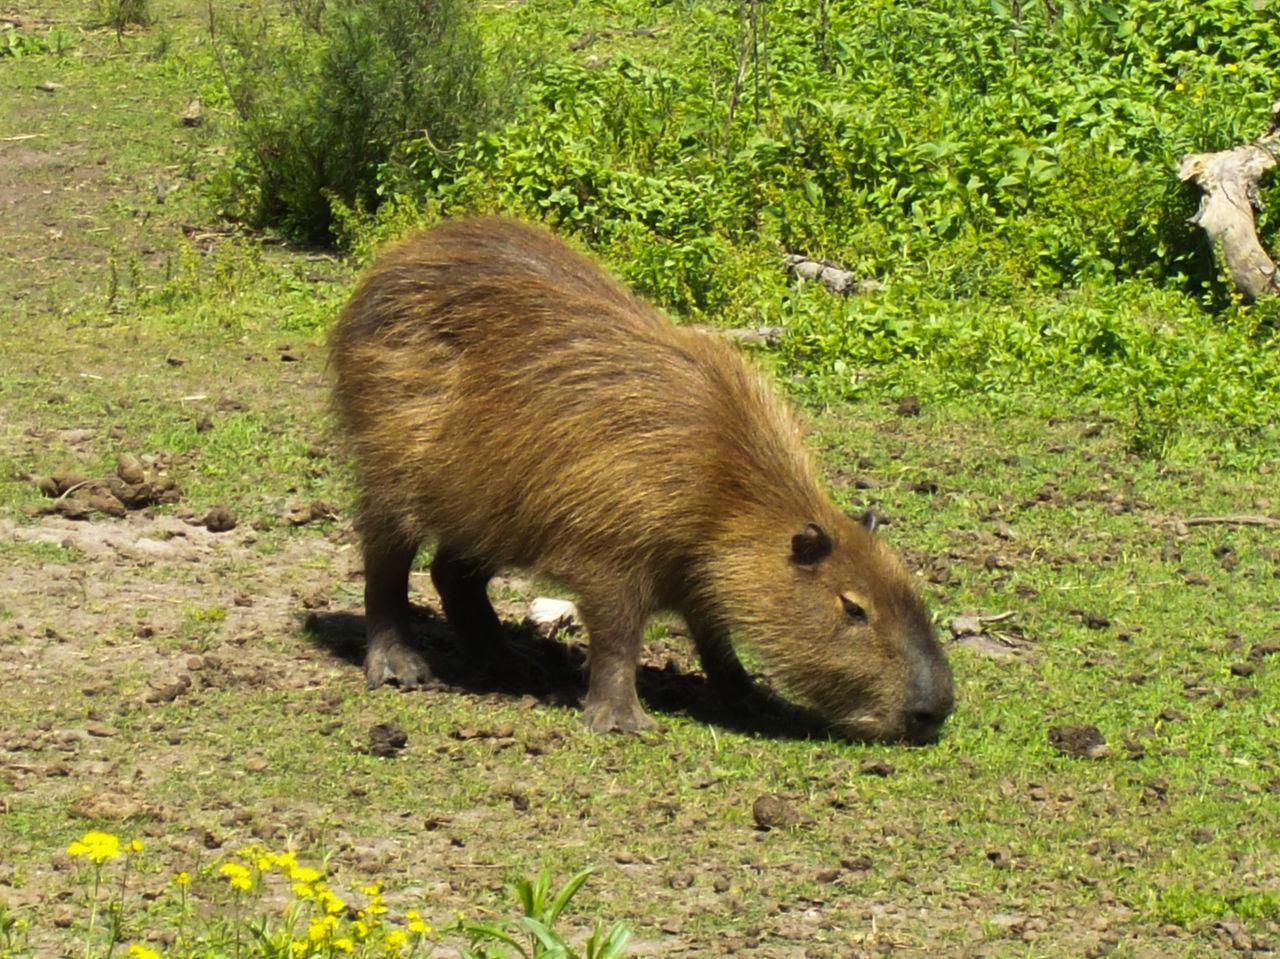 Capybara On Grassy Field